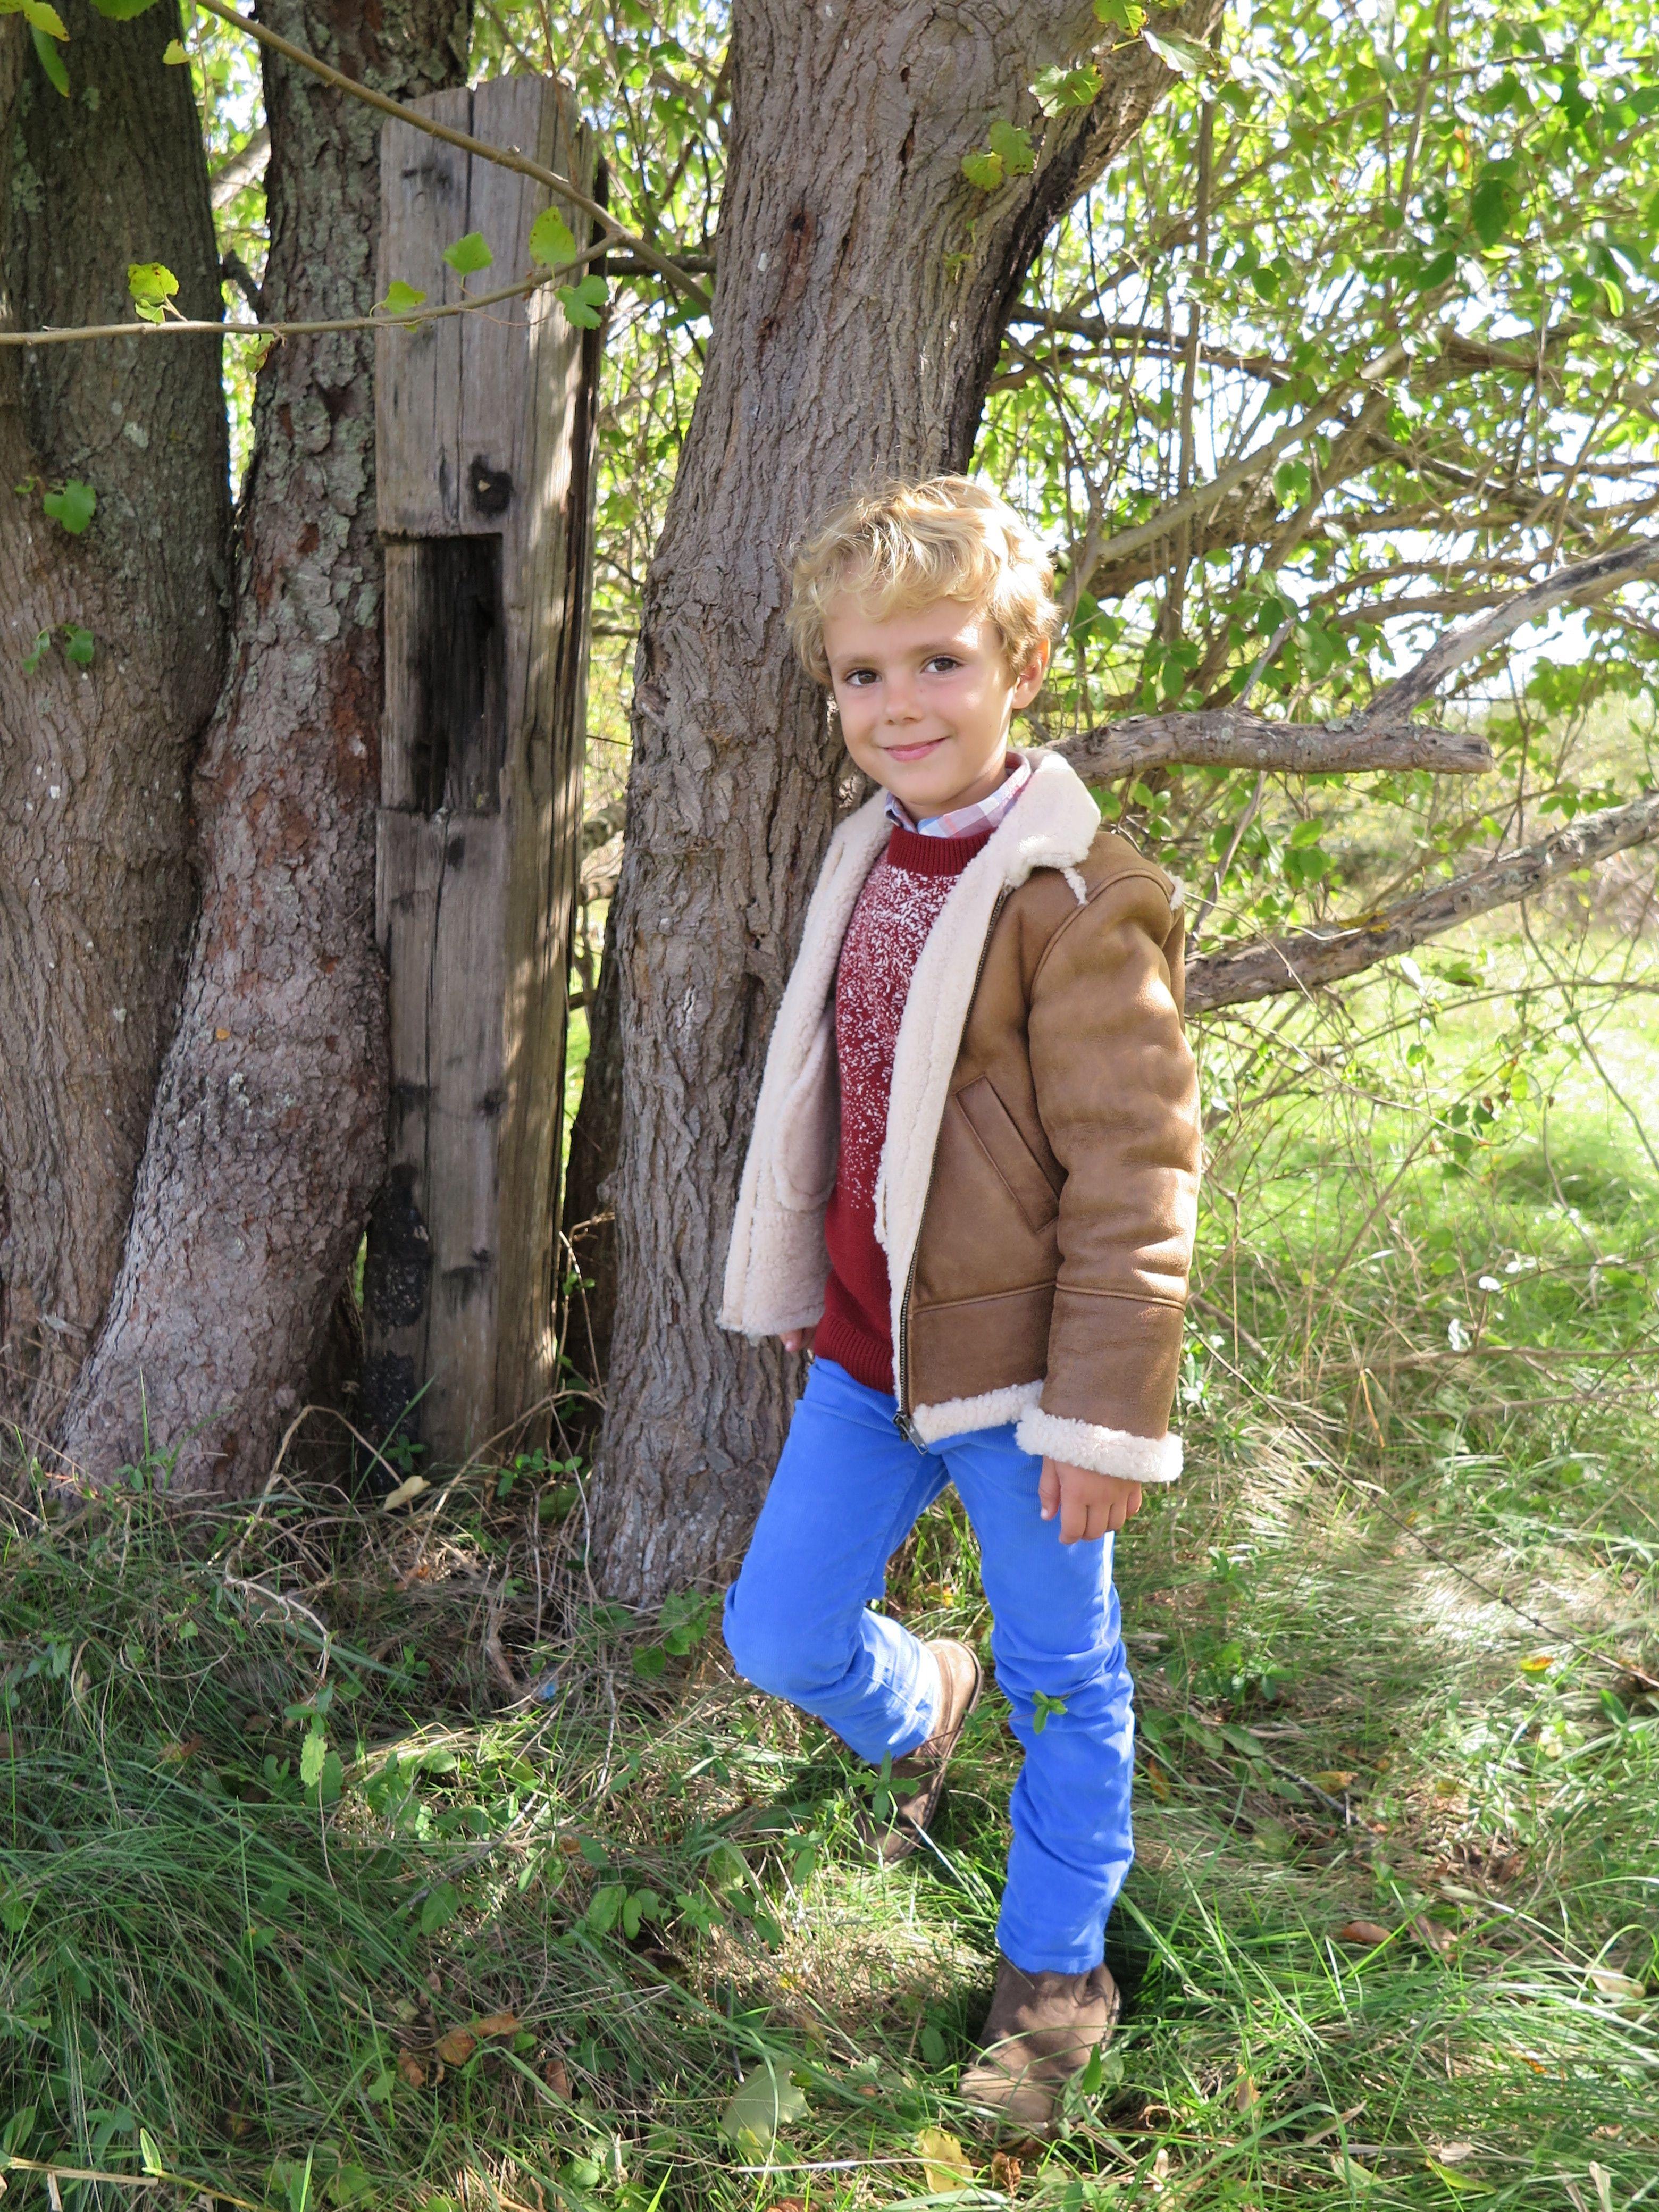 Le look #190 #Coffee #SheepskinJacket: @Bonpoint #Terracotta #MerinoSweater: @bonpoint #PlaidShirt: @jcrew #CorduroyPants: @jcrew Never Cold: www.lesnominettes.com